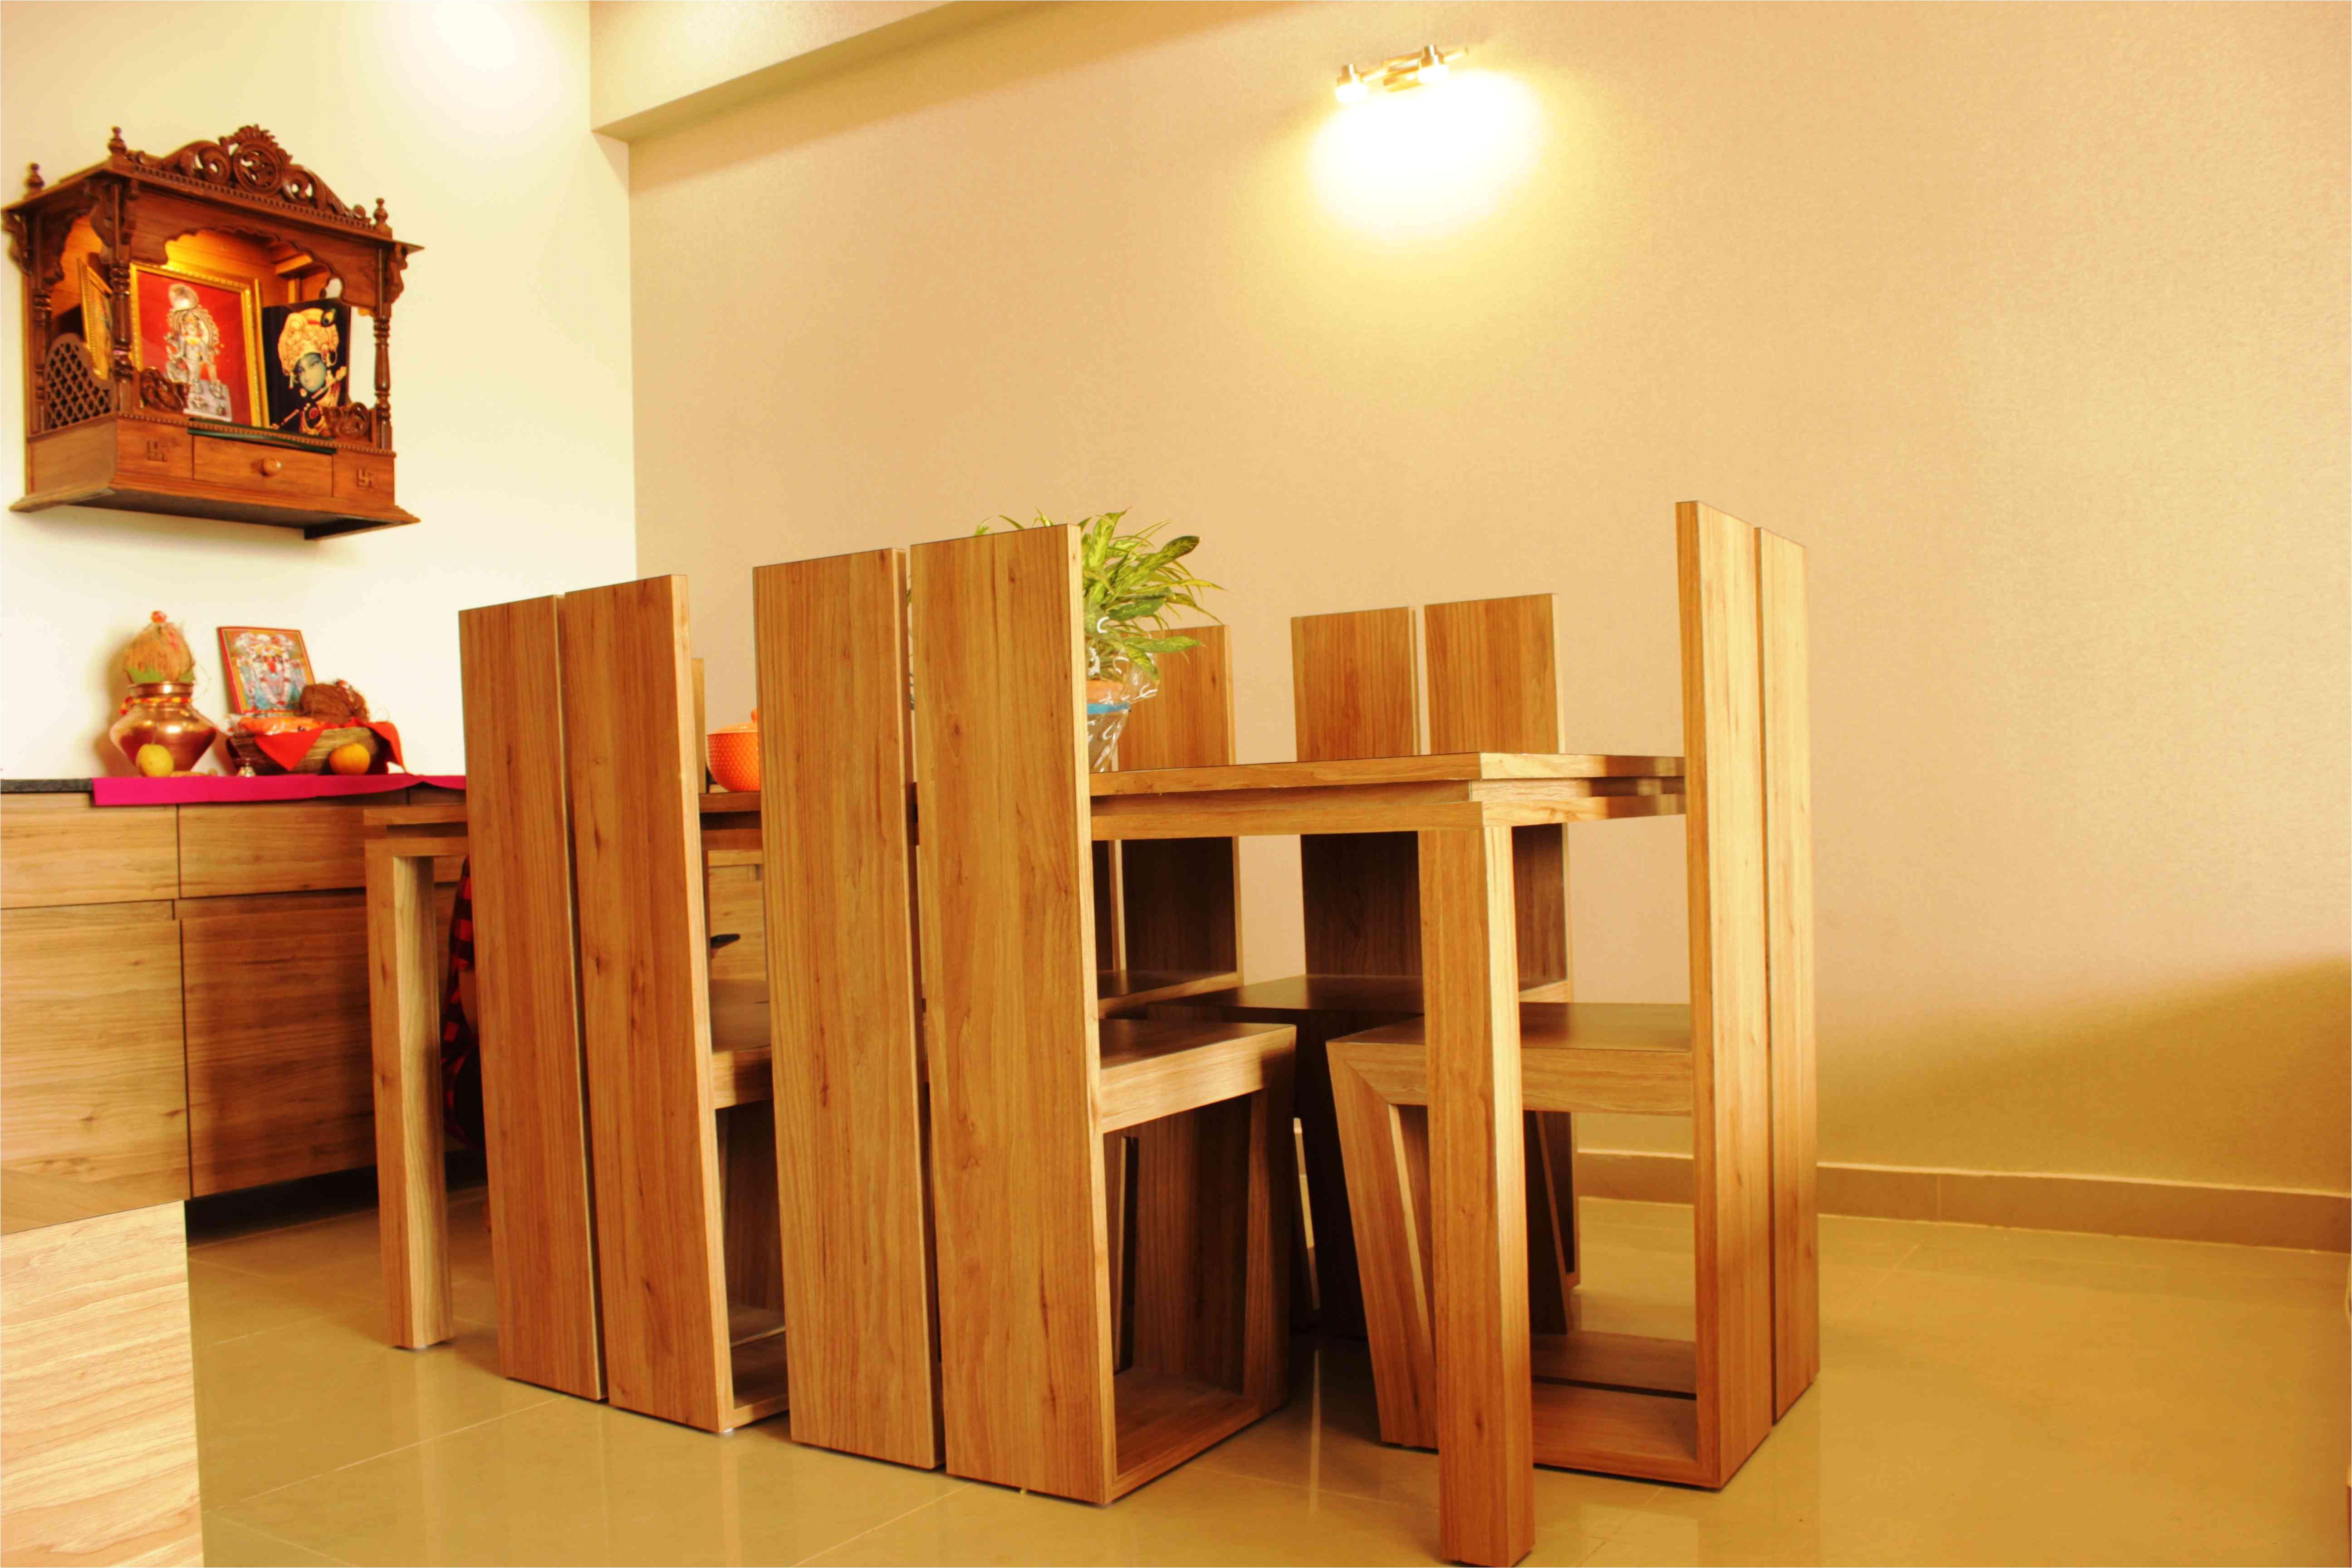 mandir and dining design by siddharth singh